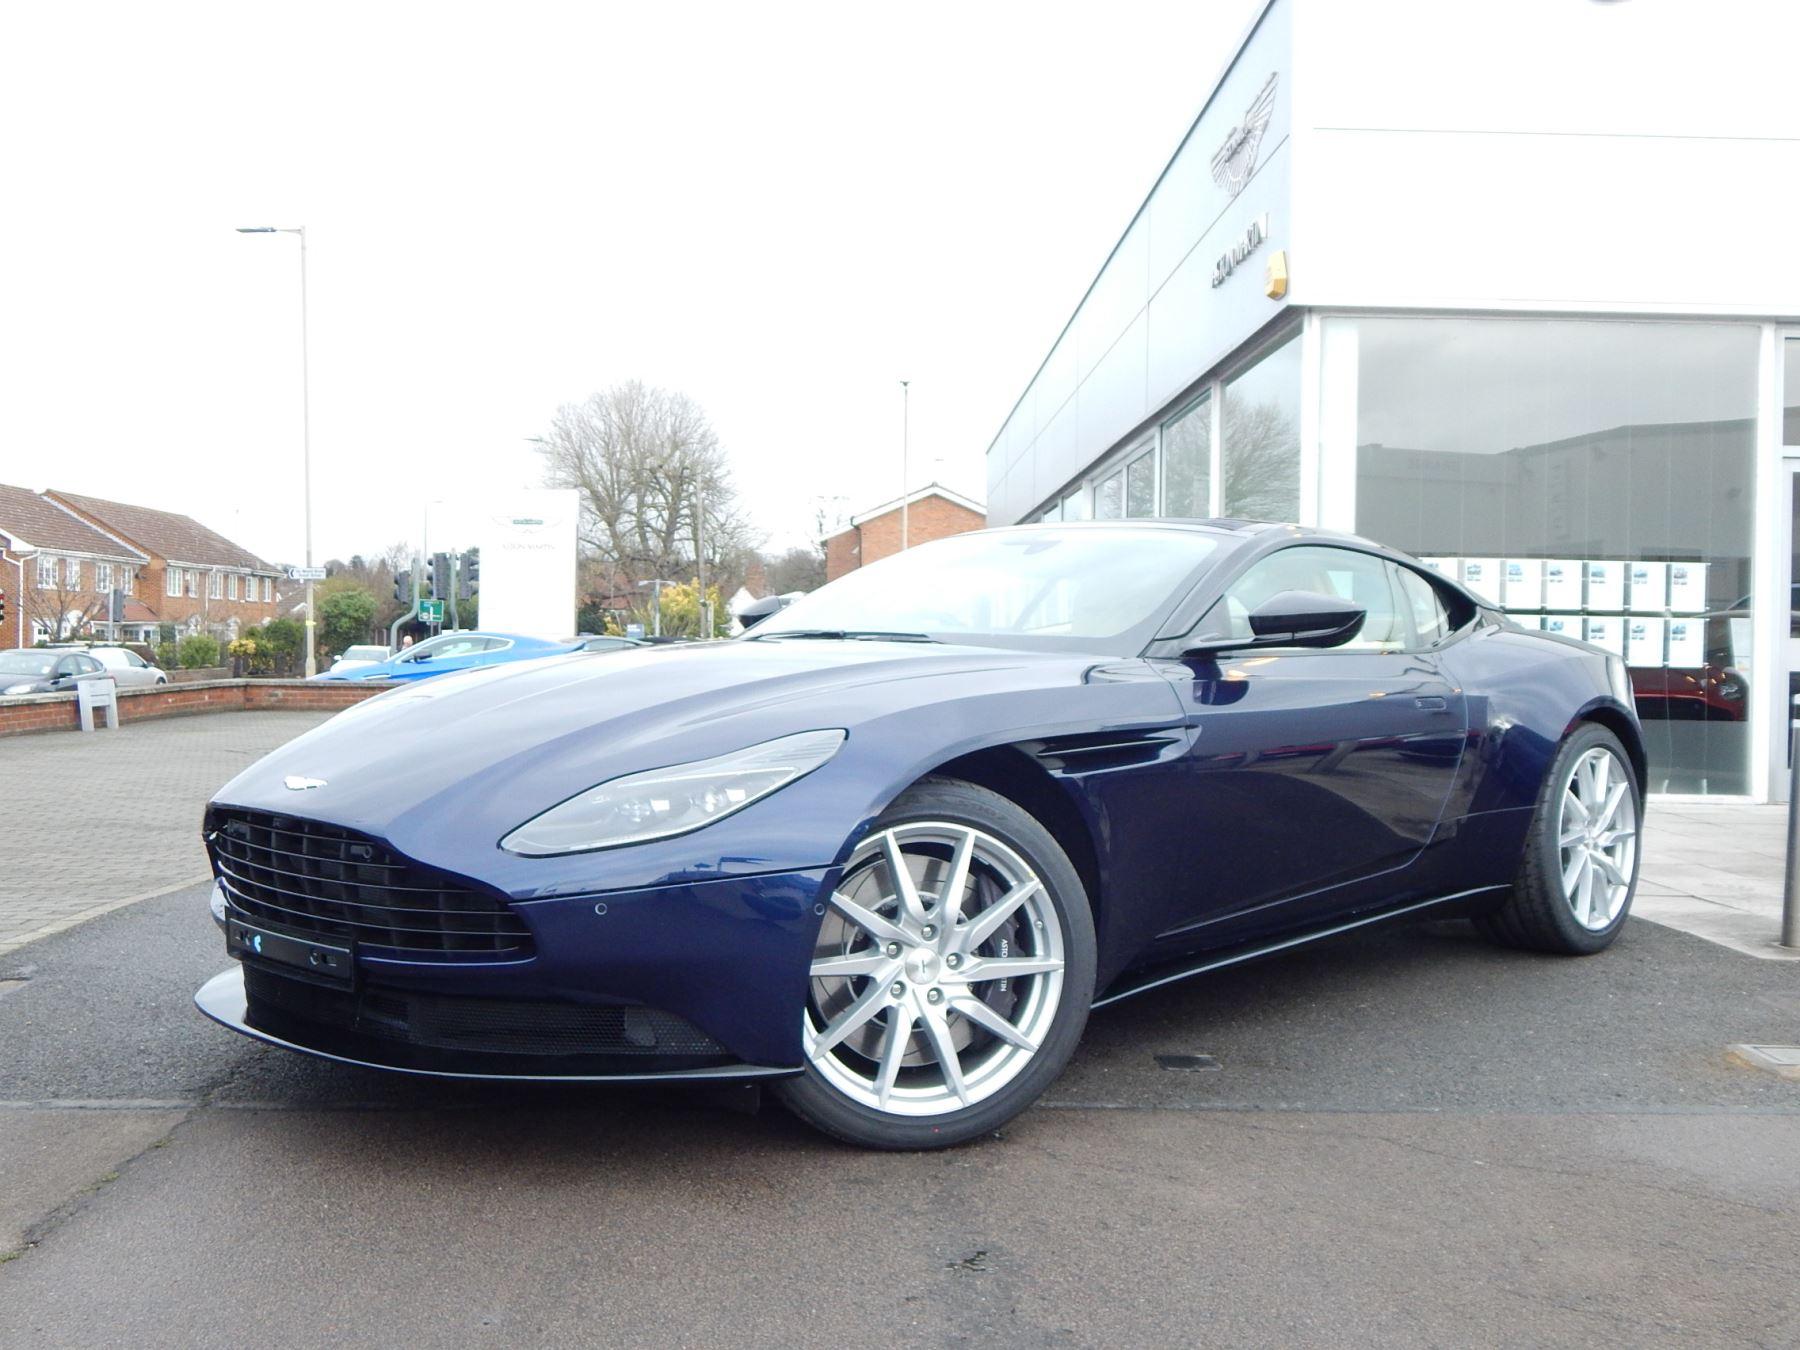 Aston Martin DB11 V8 Touchtronic image 7